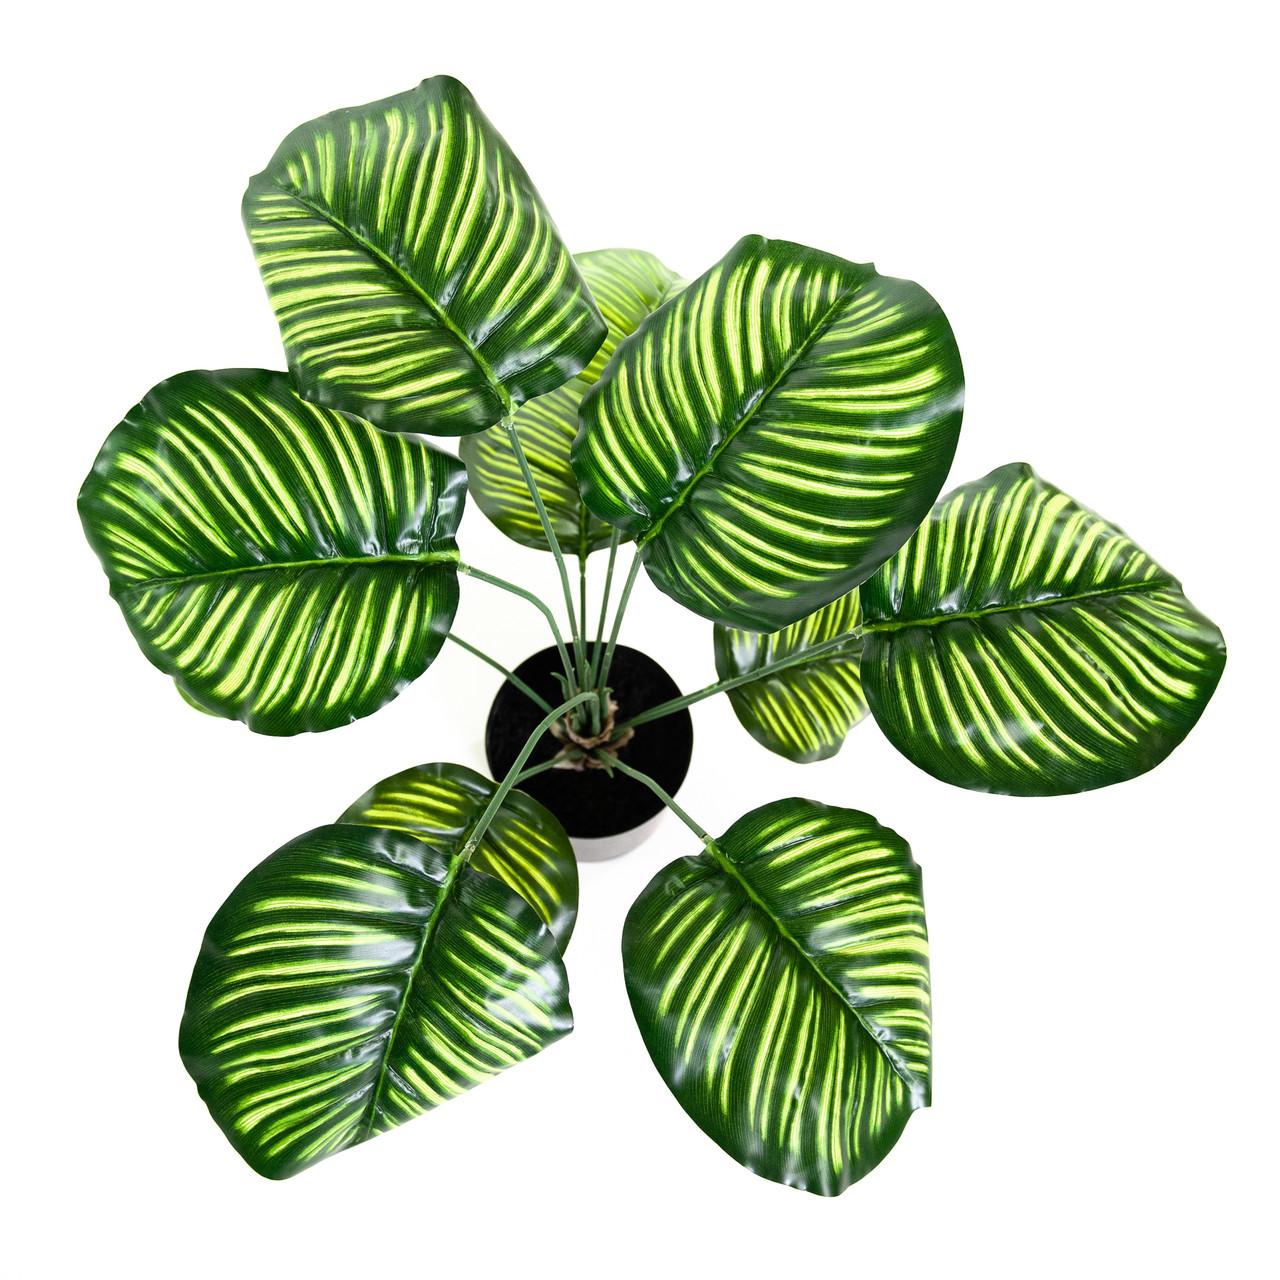 Kunst Calathea Orbifolia Pauwenplant 60 cm